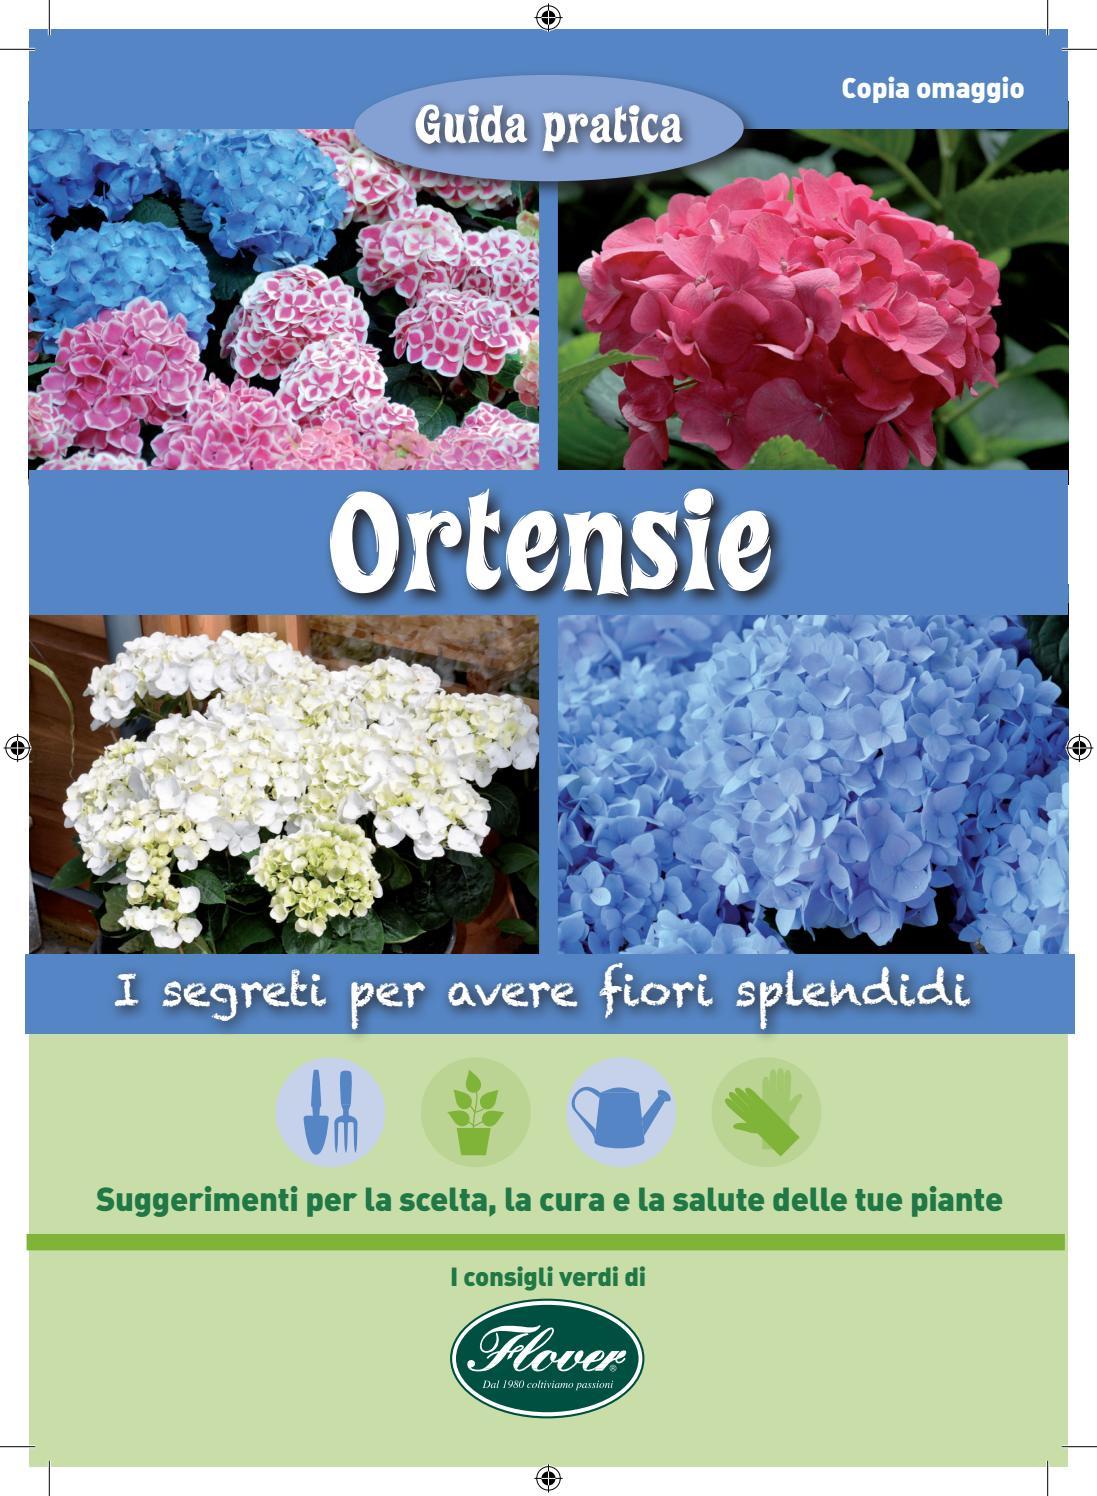 Ortensie Bianche Come Curarle ortensie - i segreti per avere fiori splendidi - flover by